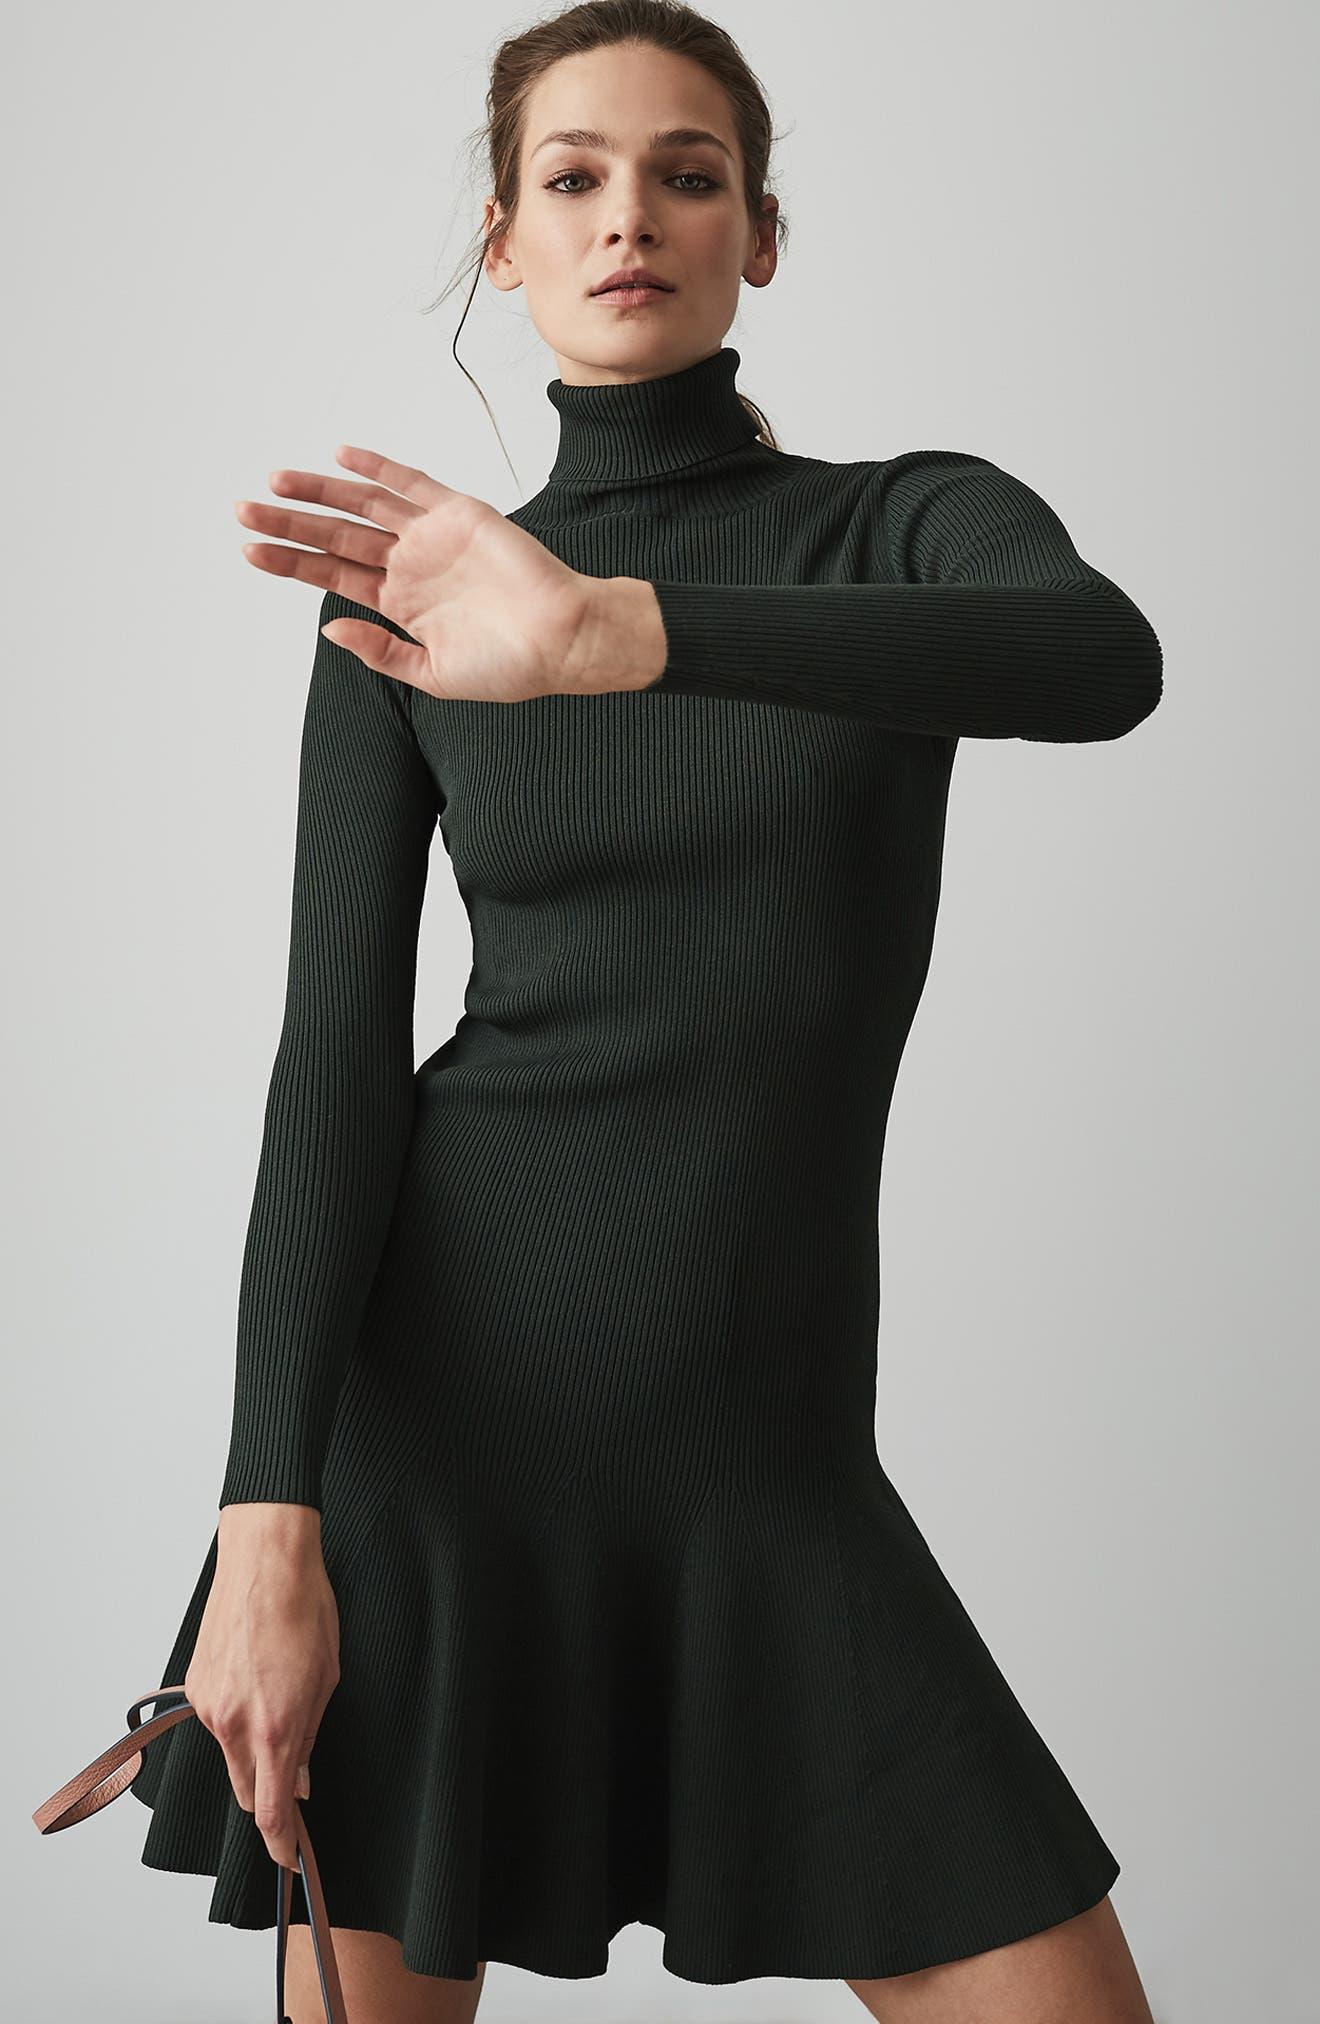 REISS,                             Mimi Turtleneck Sweater Dress,                             Alternate thumbnail 7, color,                             GREEN